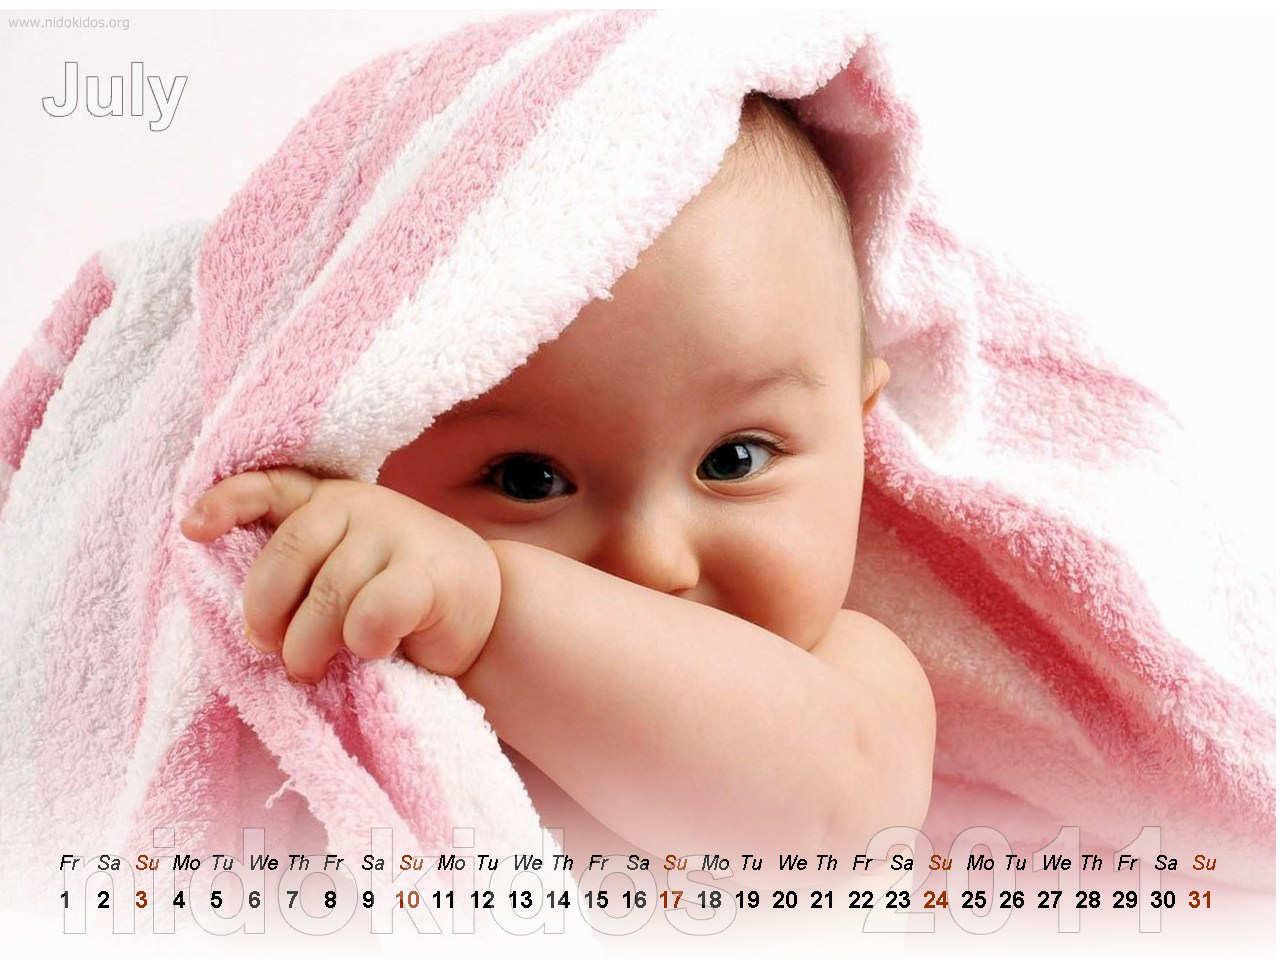 Cute Newborn Baby Images: Cute Baby Calendar 2011